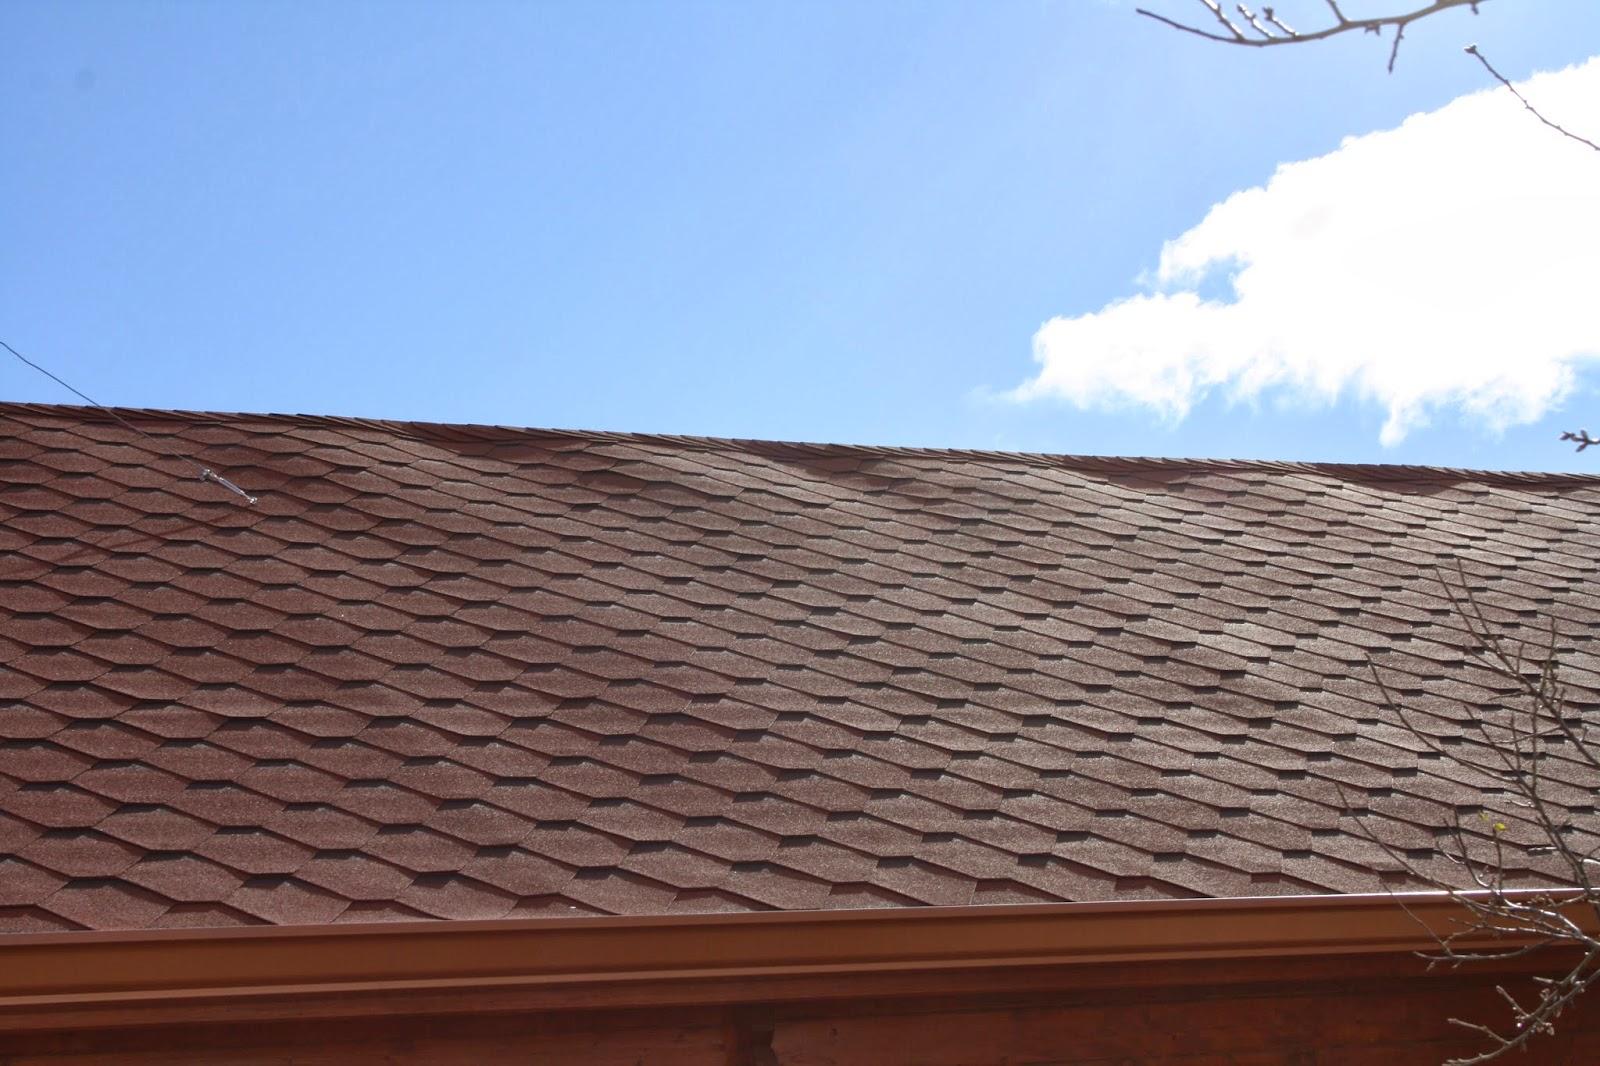 Chapa estilo teja instaladores panel s ndwich madrid - Paneles imitacion madera ...